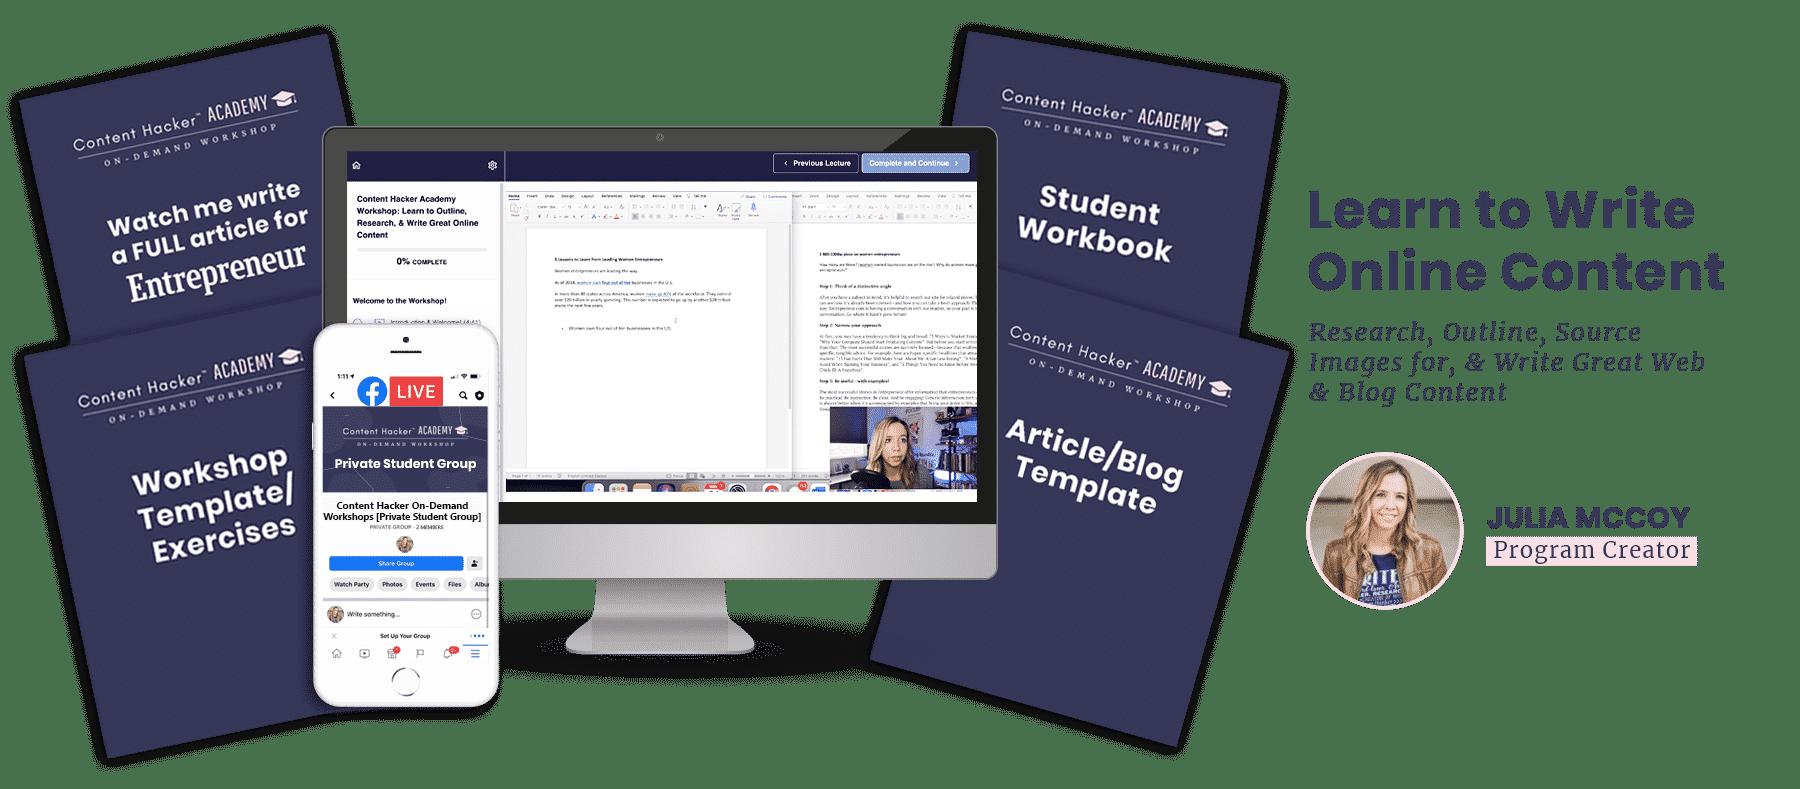 learn to write workshop